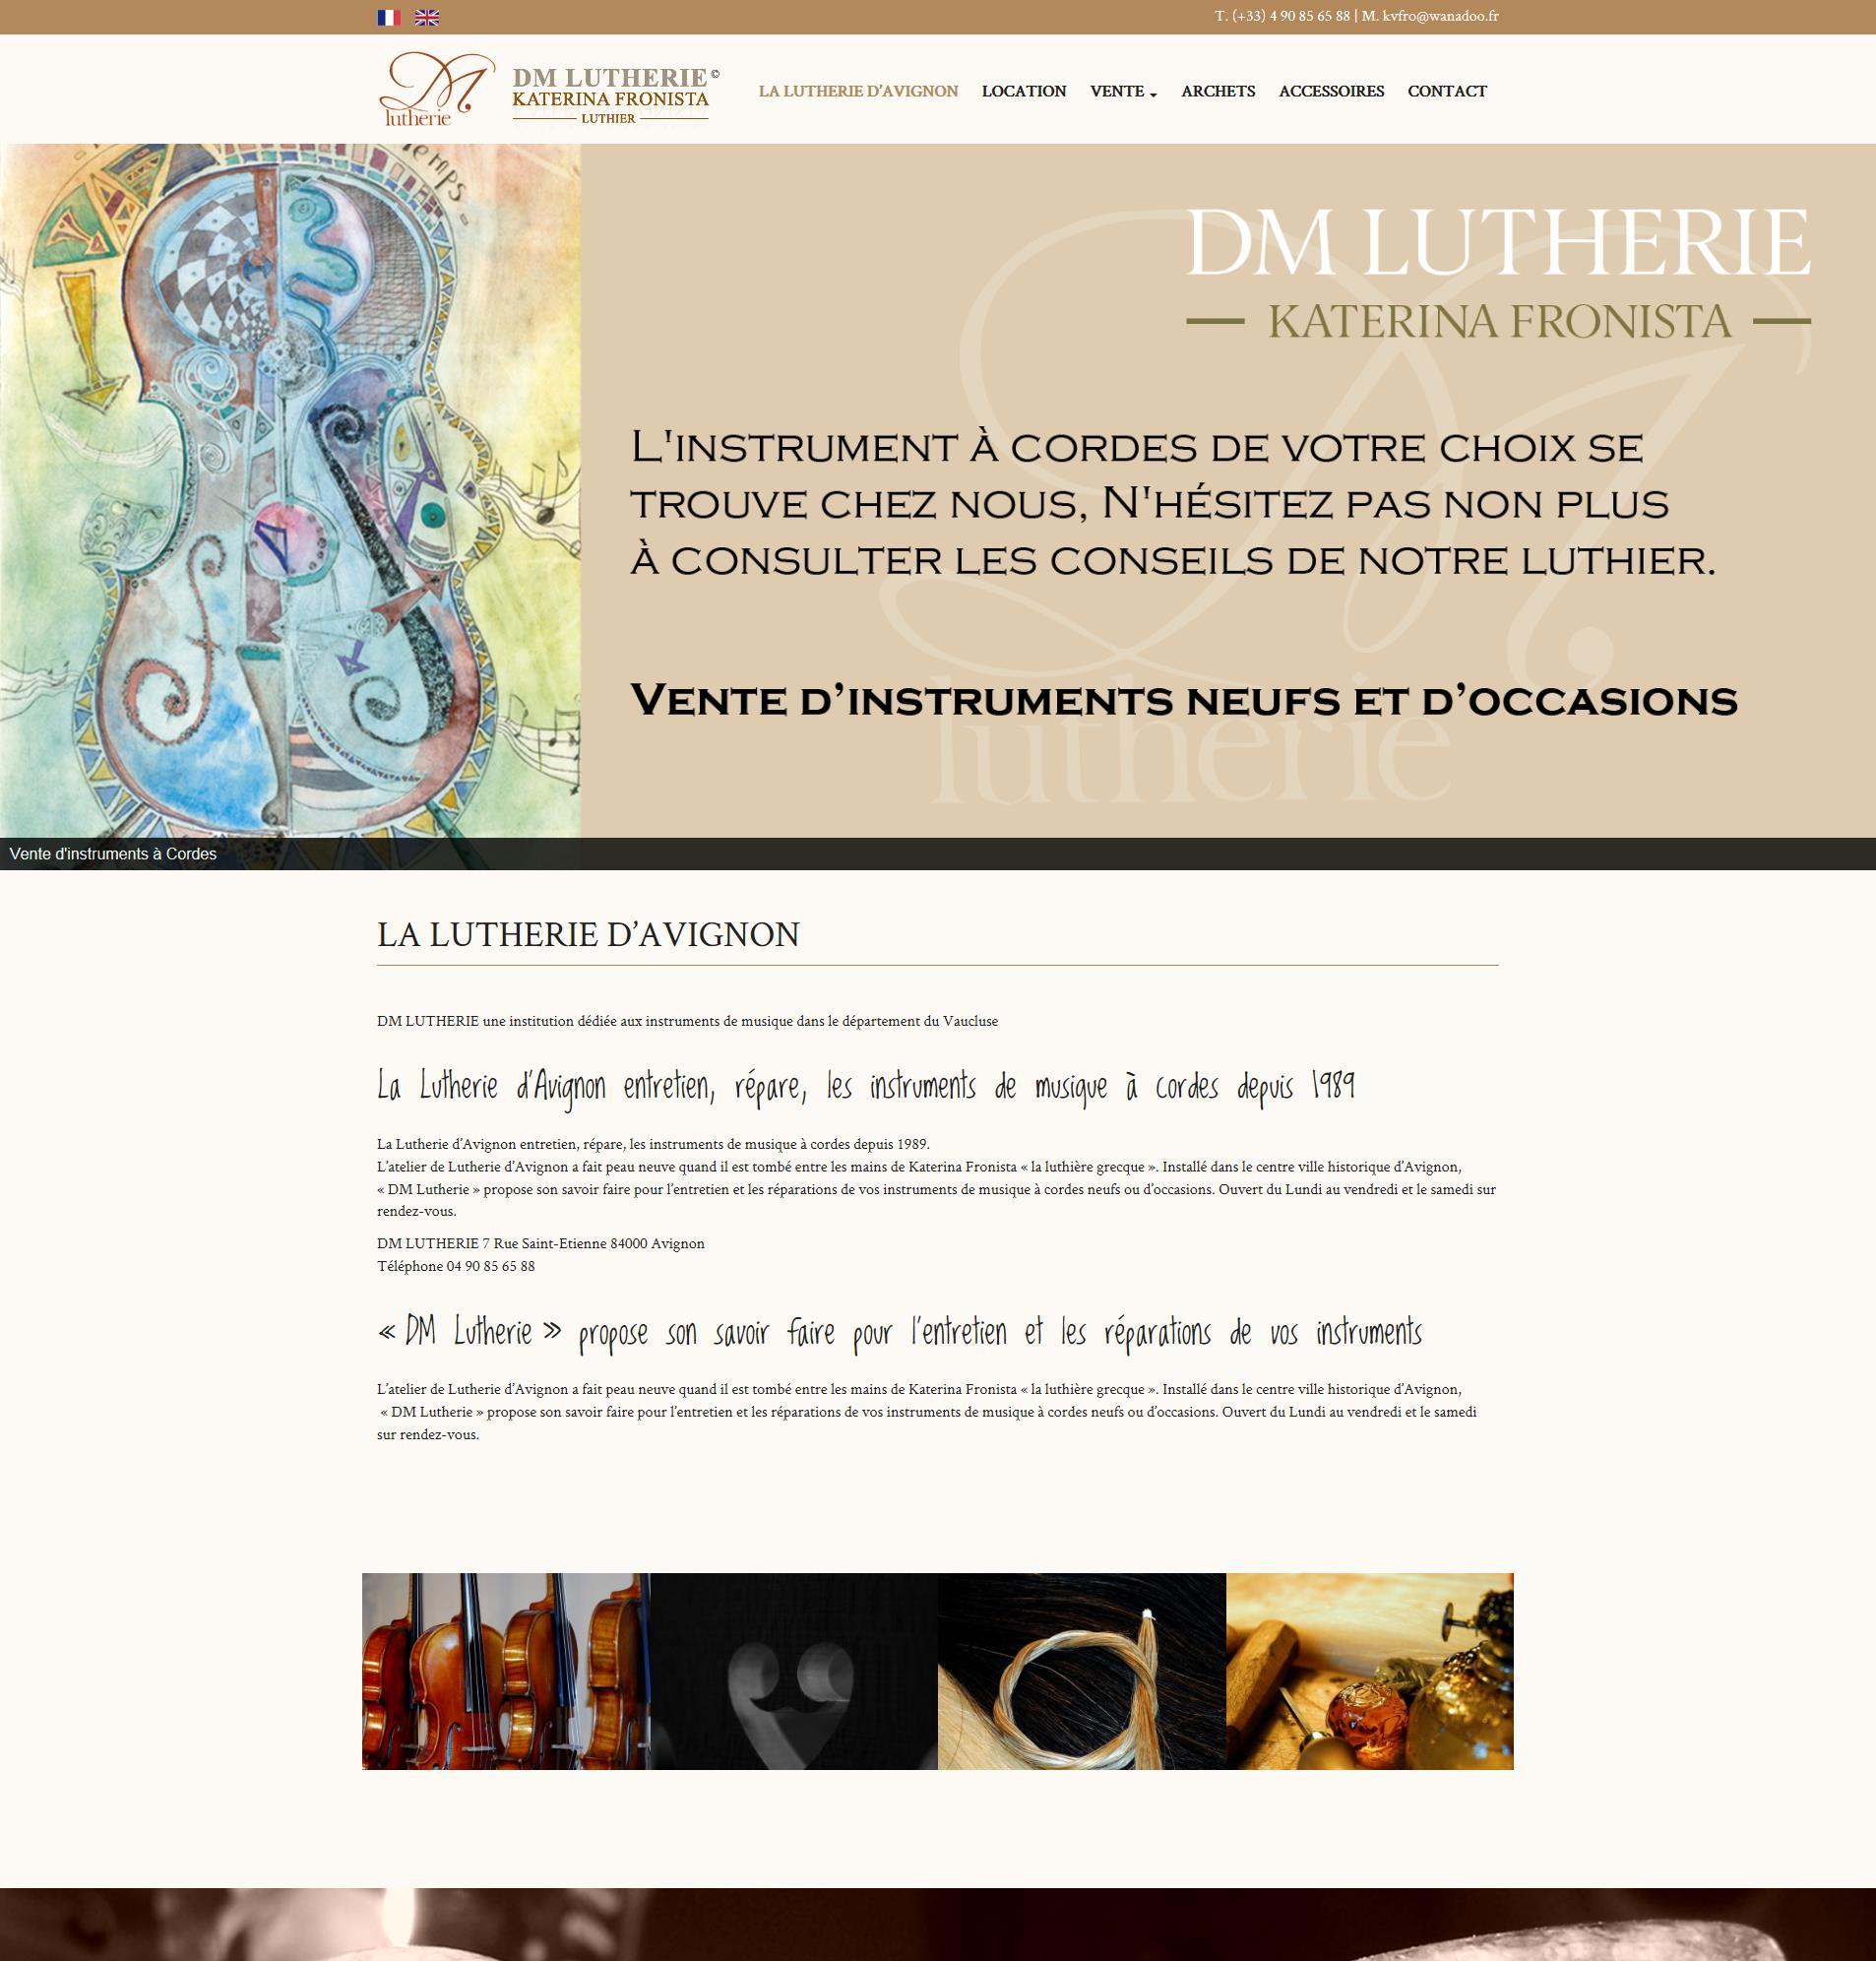 DM Lutherie, Lutherie à Avignon